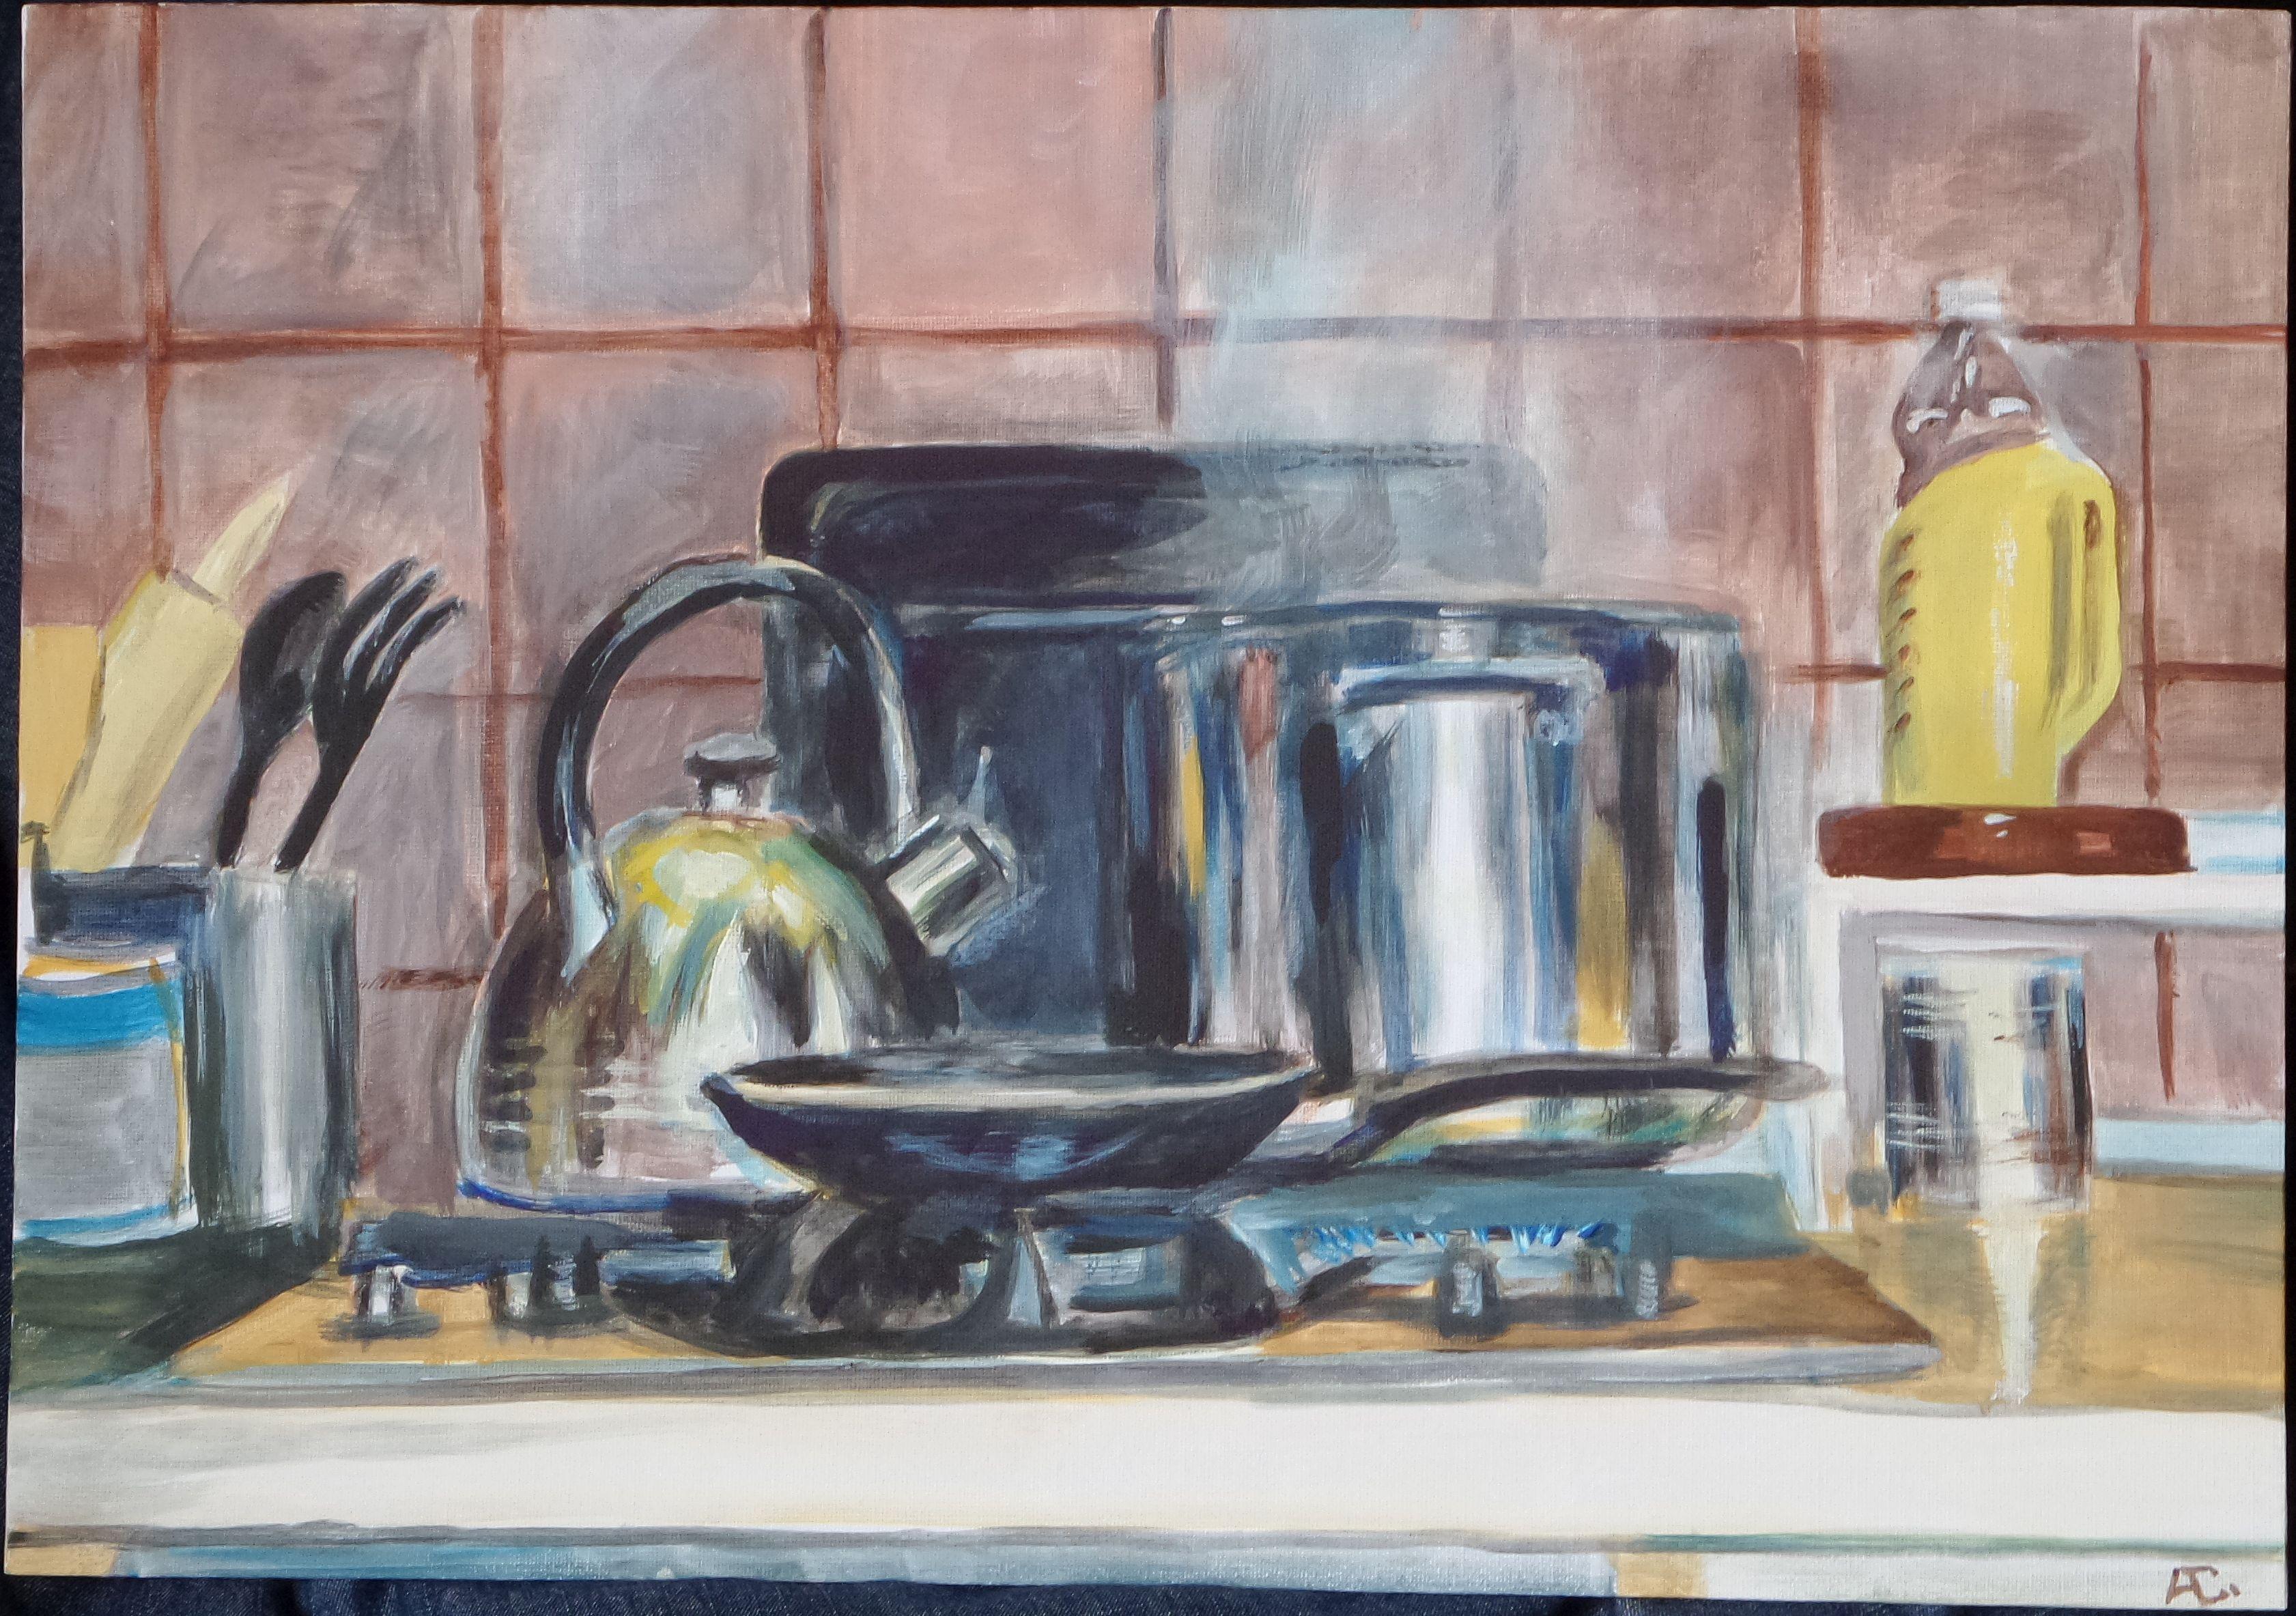 Kitchen-drawing.jpg